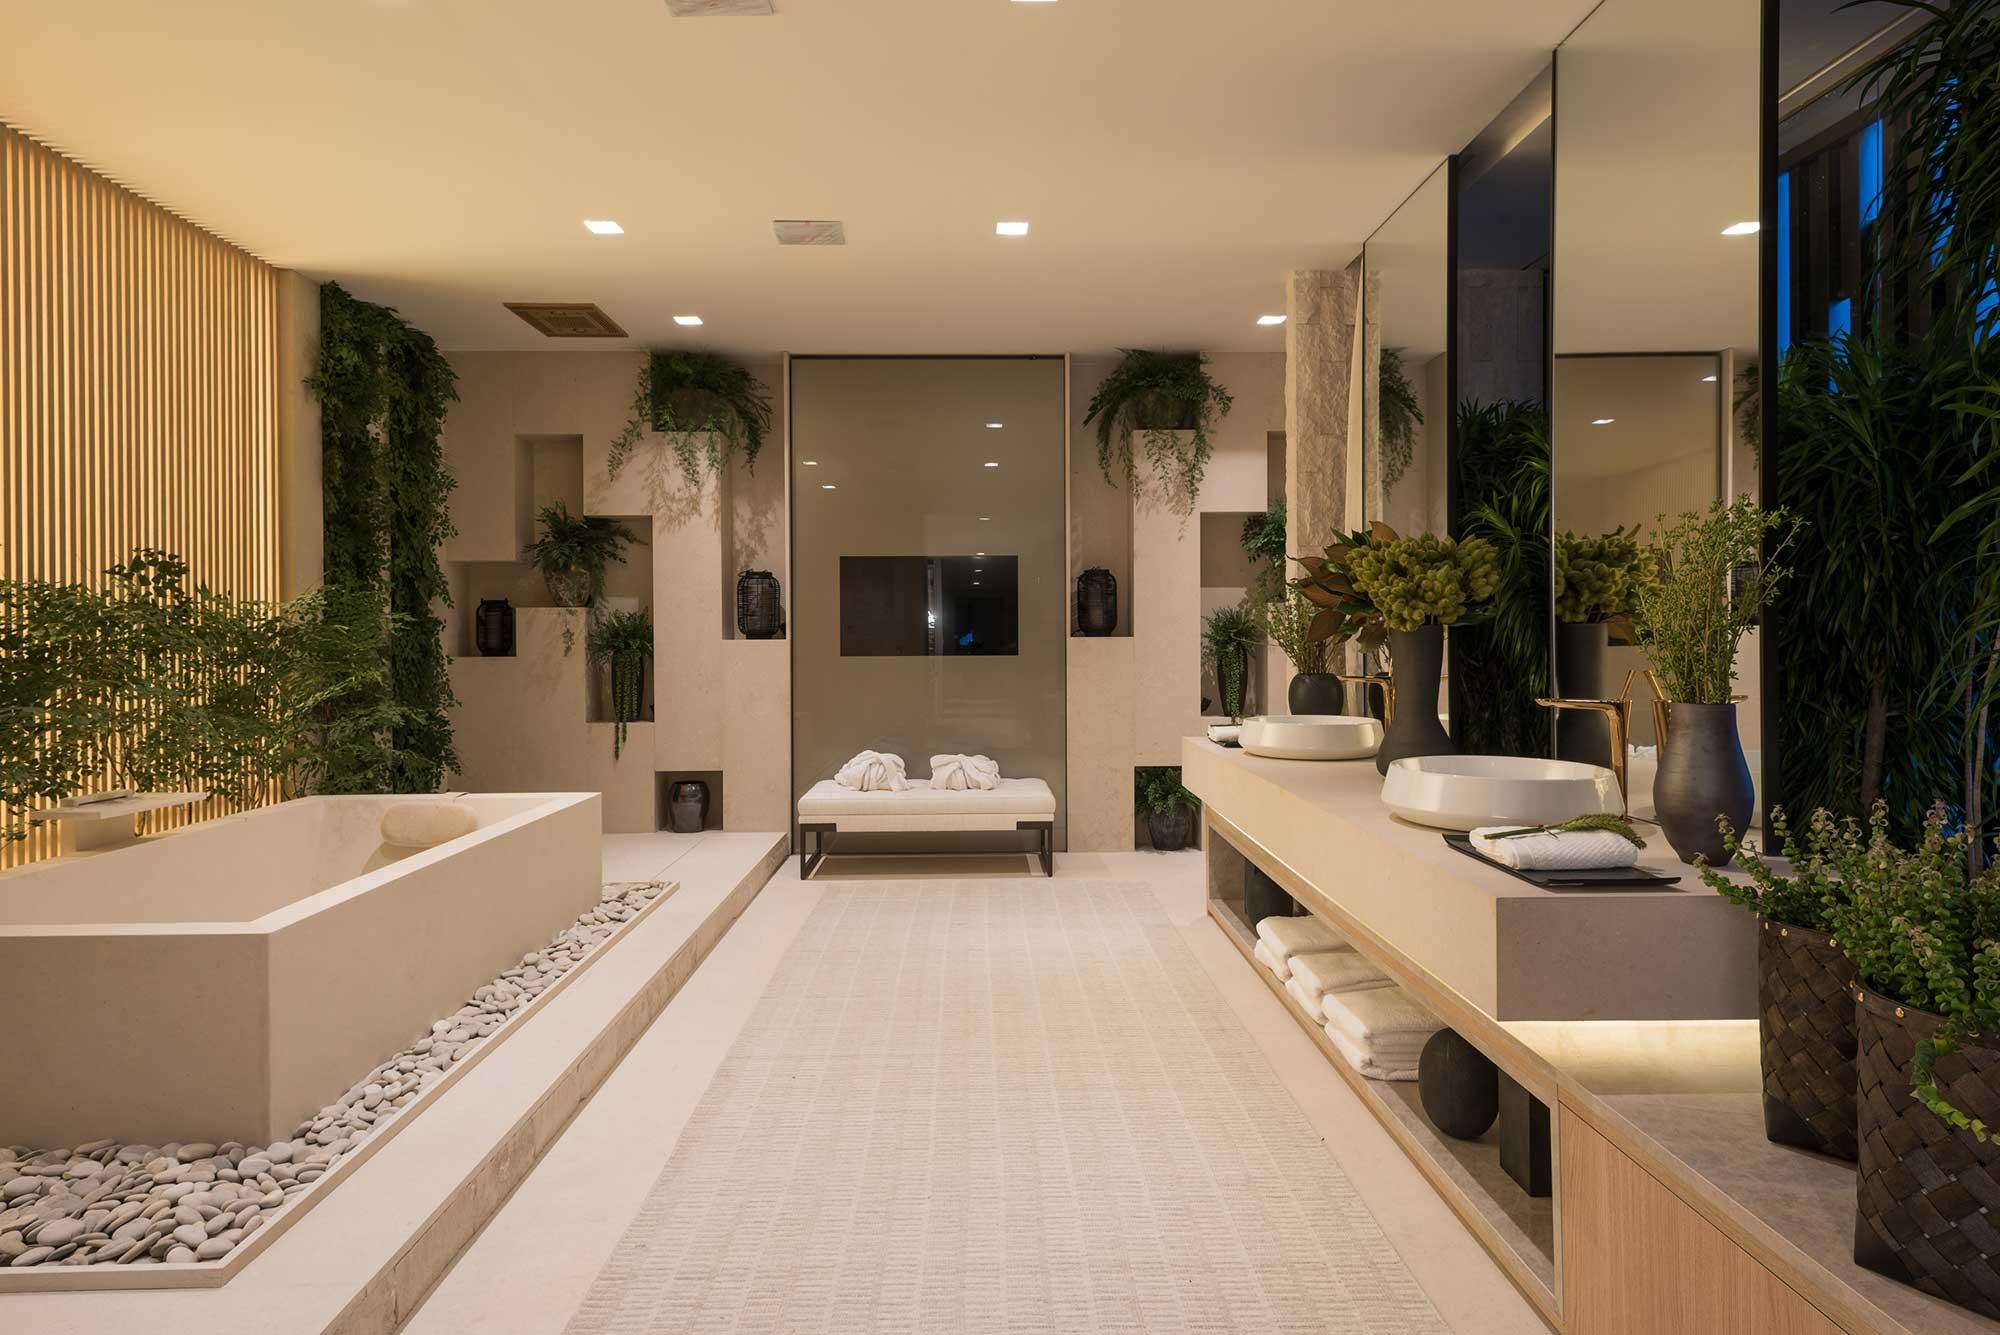 shower plants debora aguiar casacor